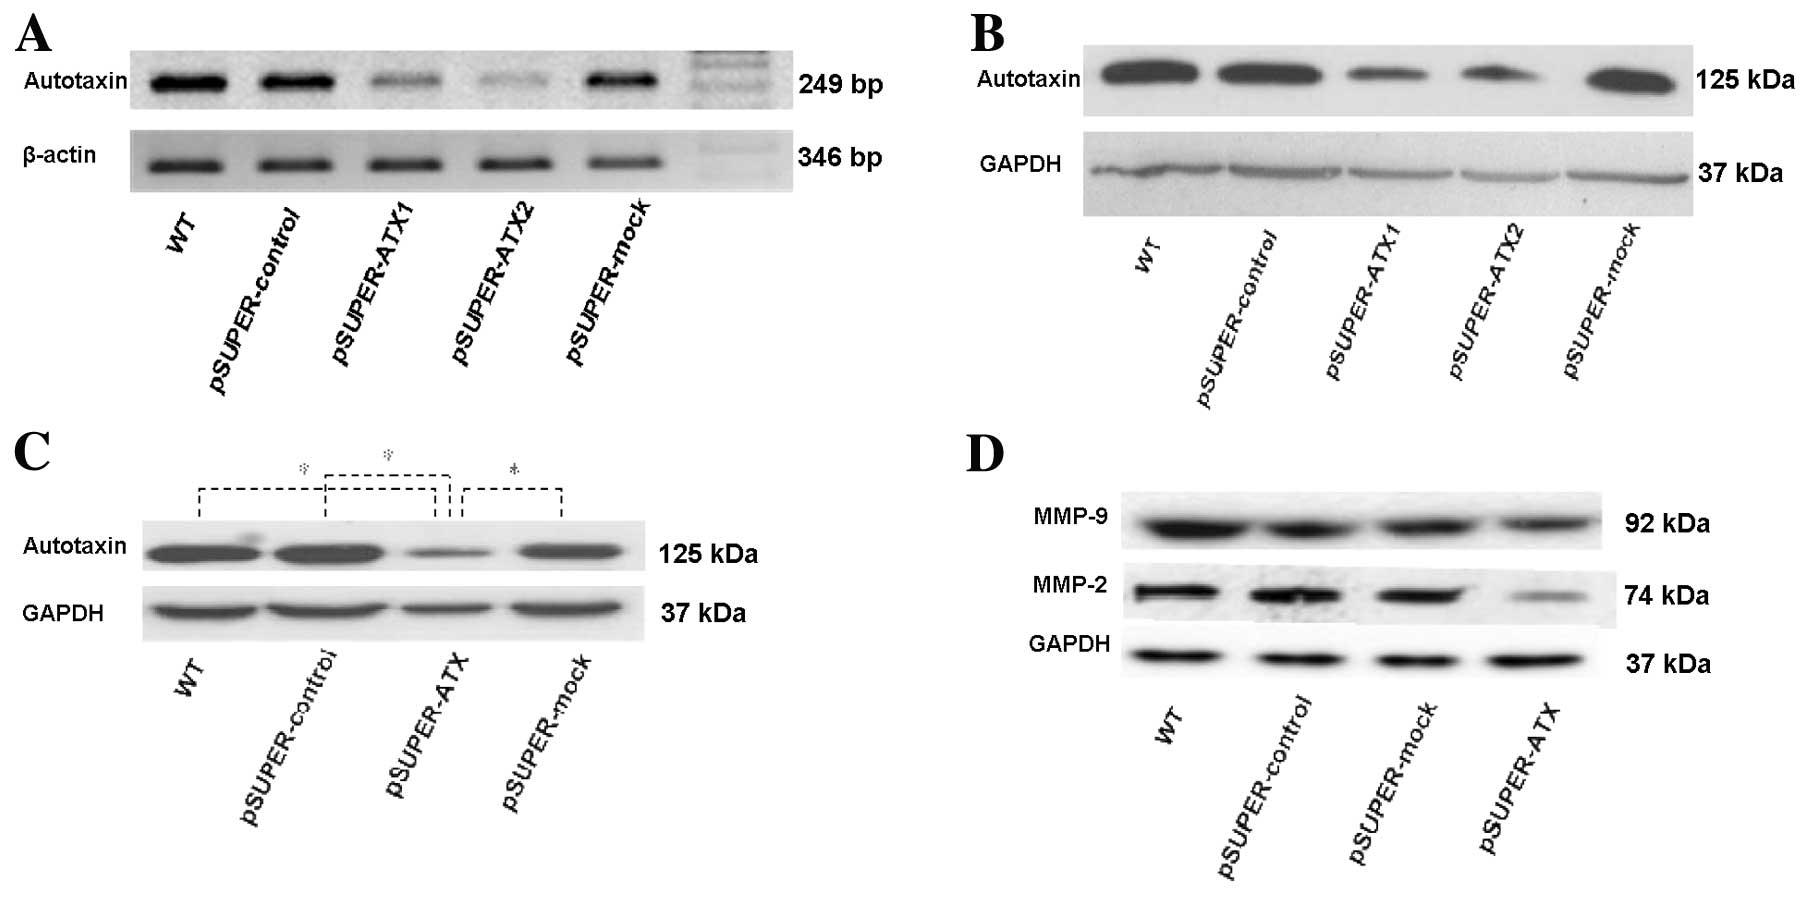 Short hairpin RNA targeting autotaxin reduces human